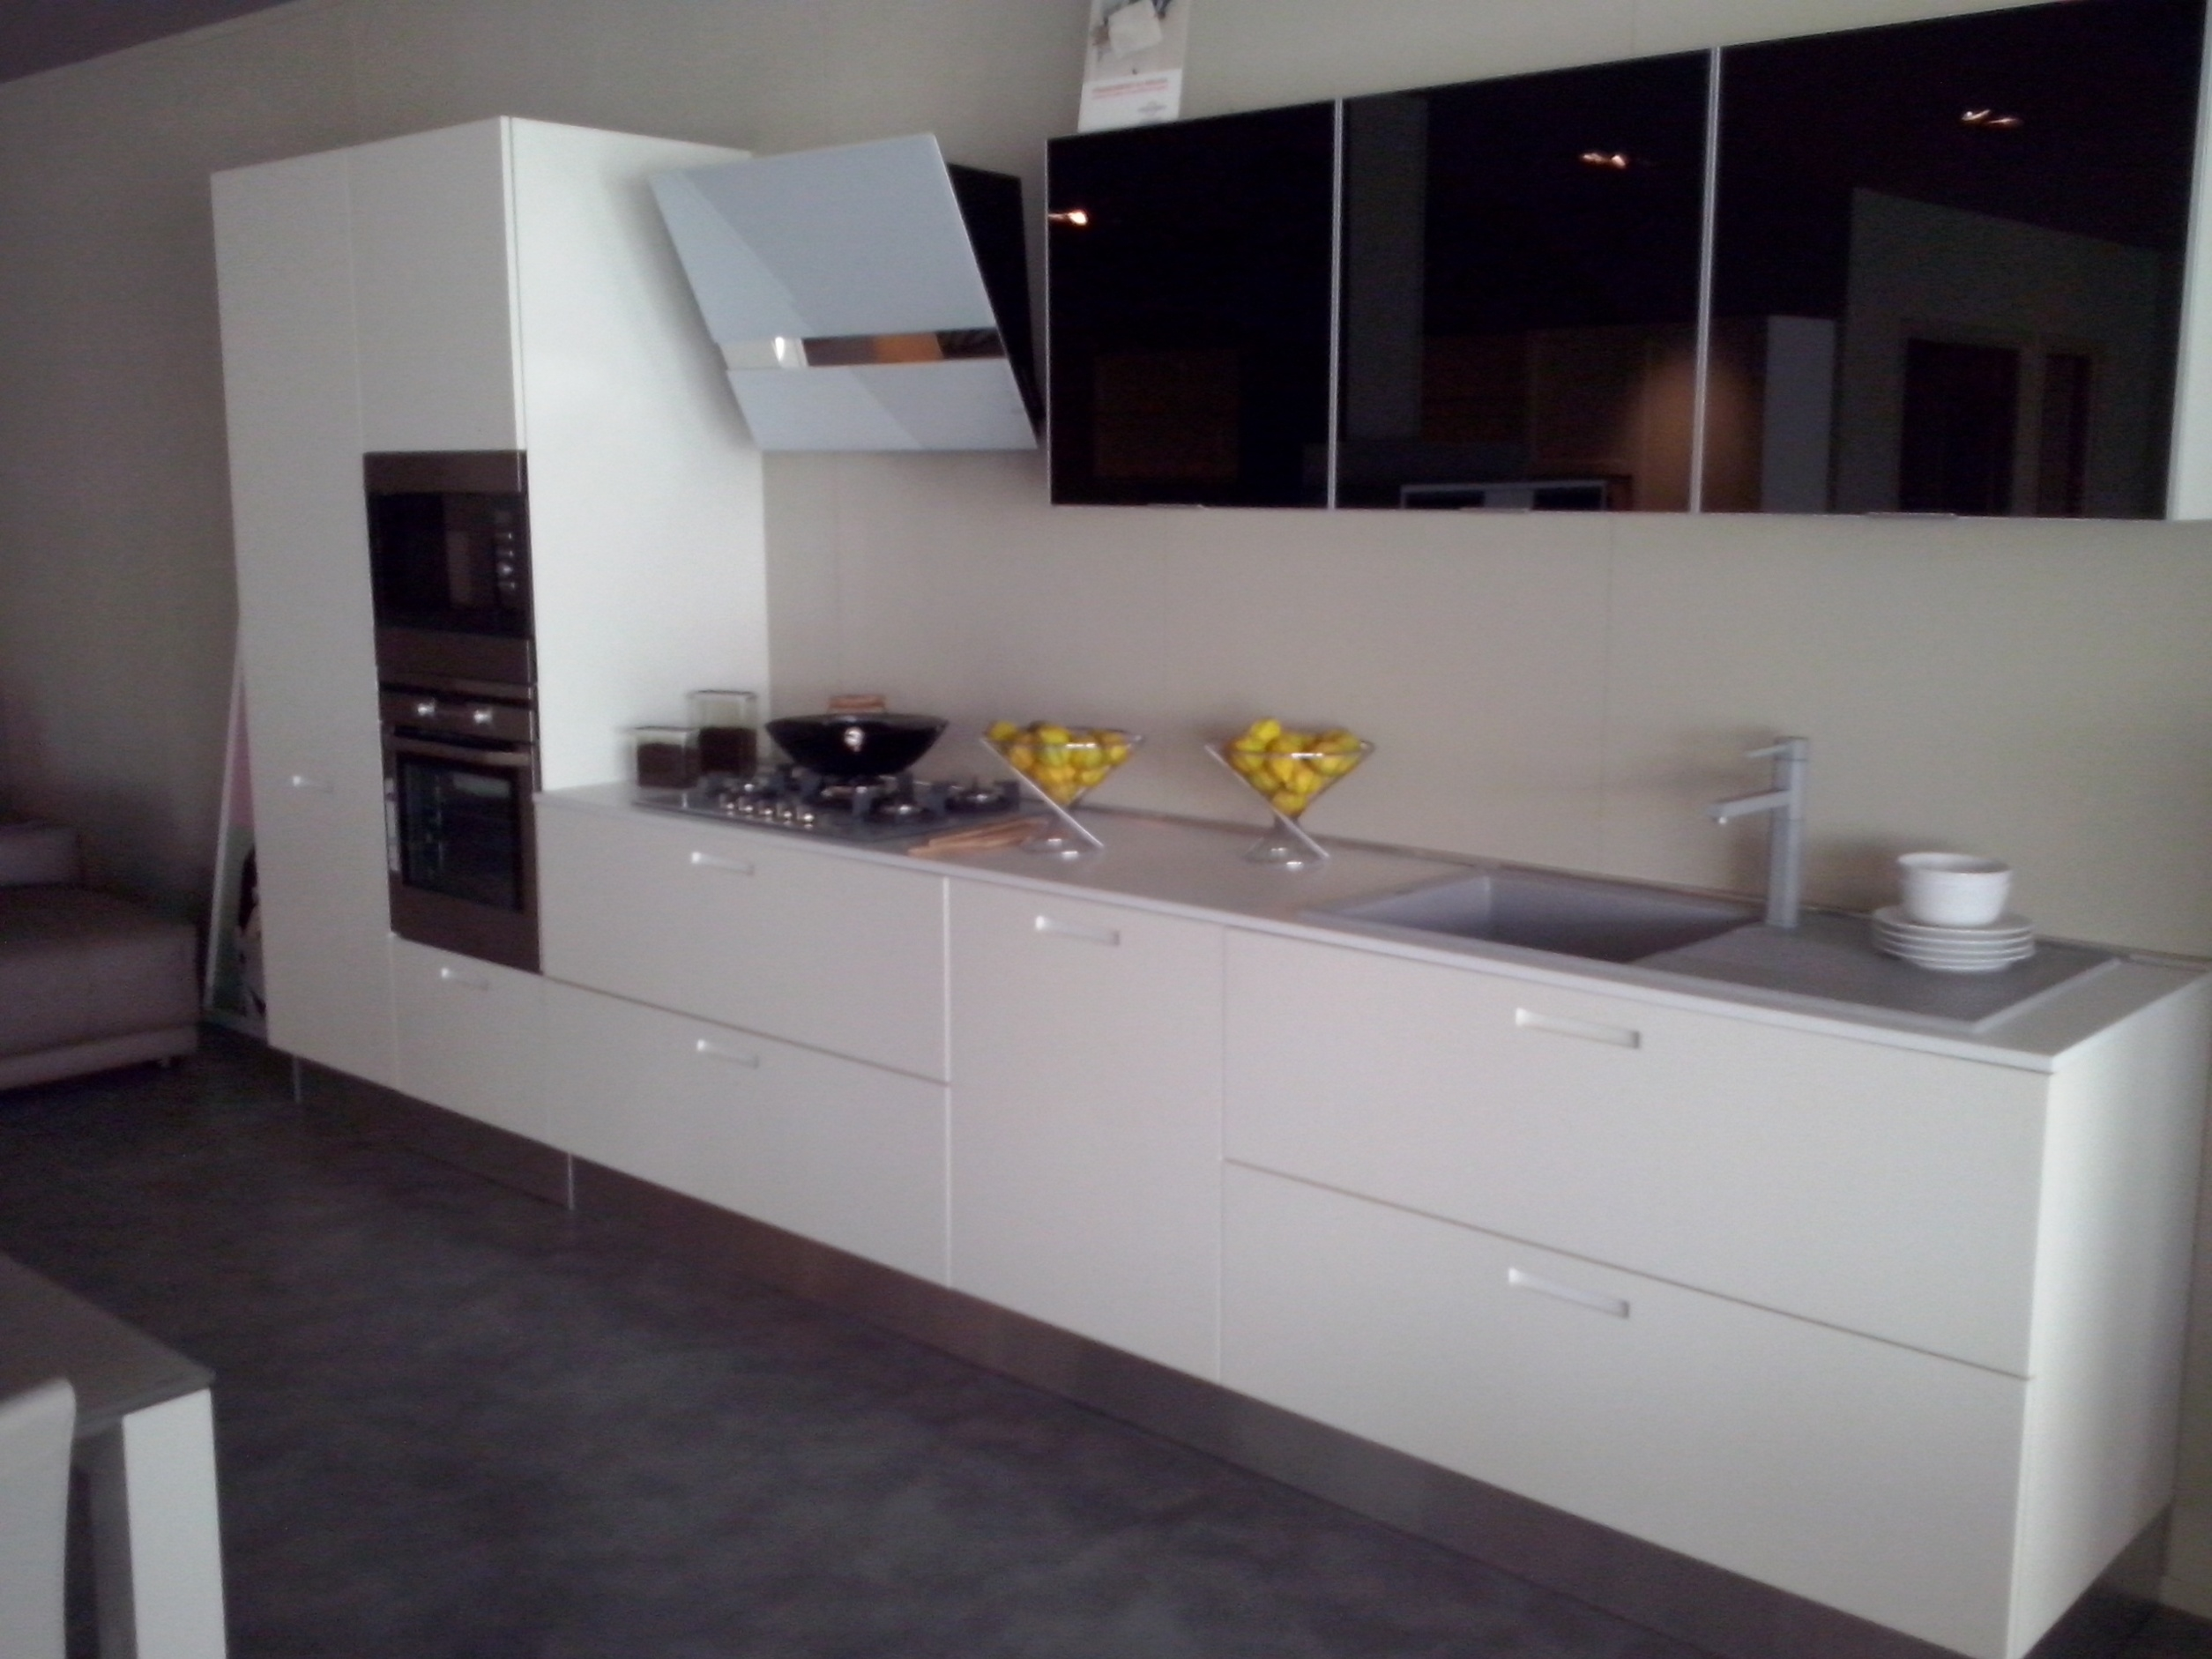 Stunning maniglie per cucine moderne photos - Cucine colorate moderne ...